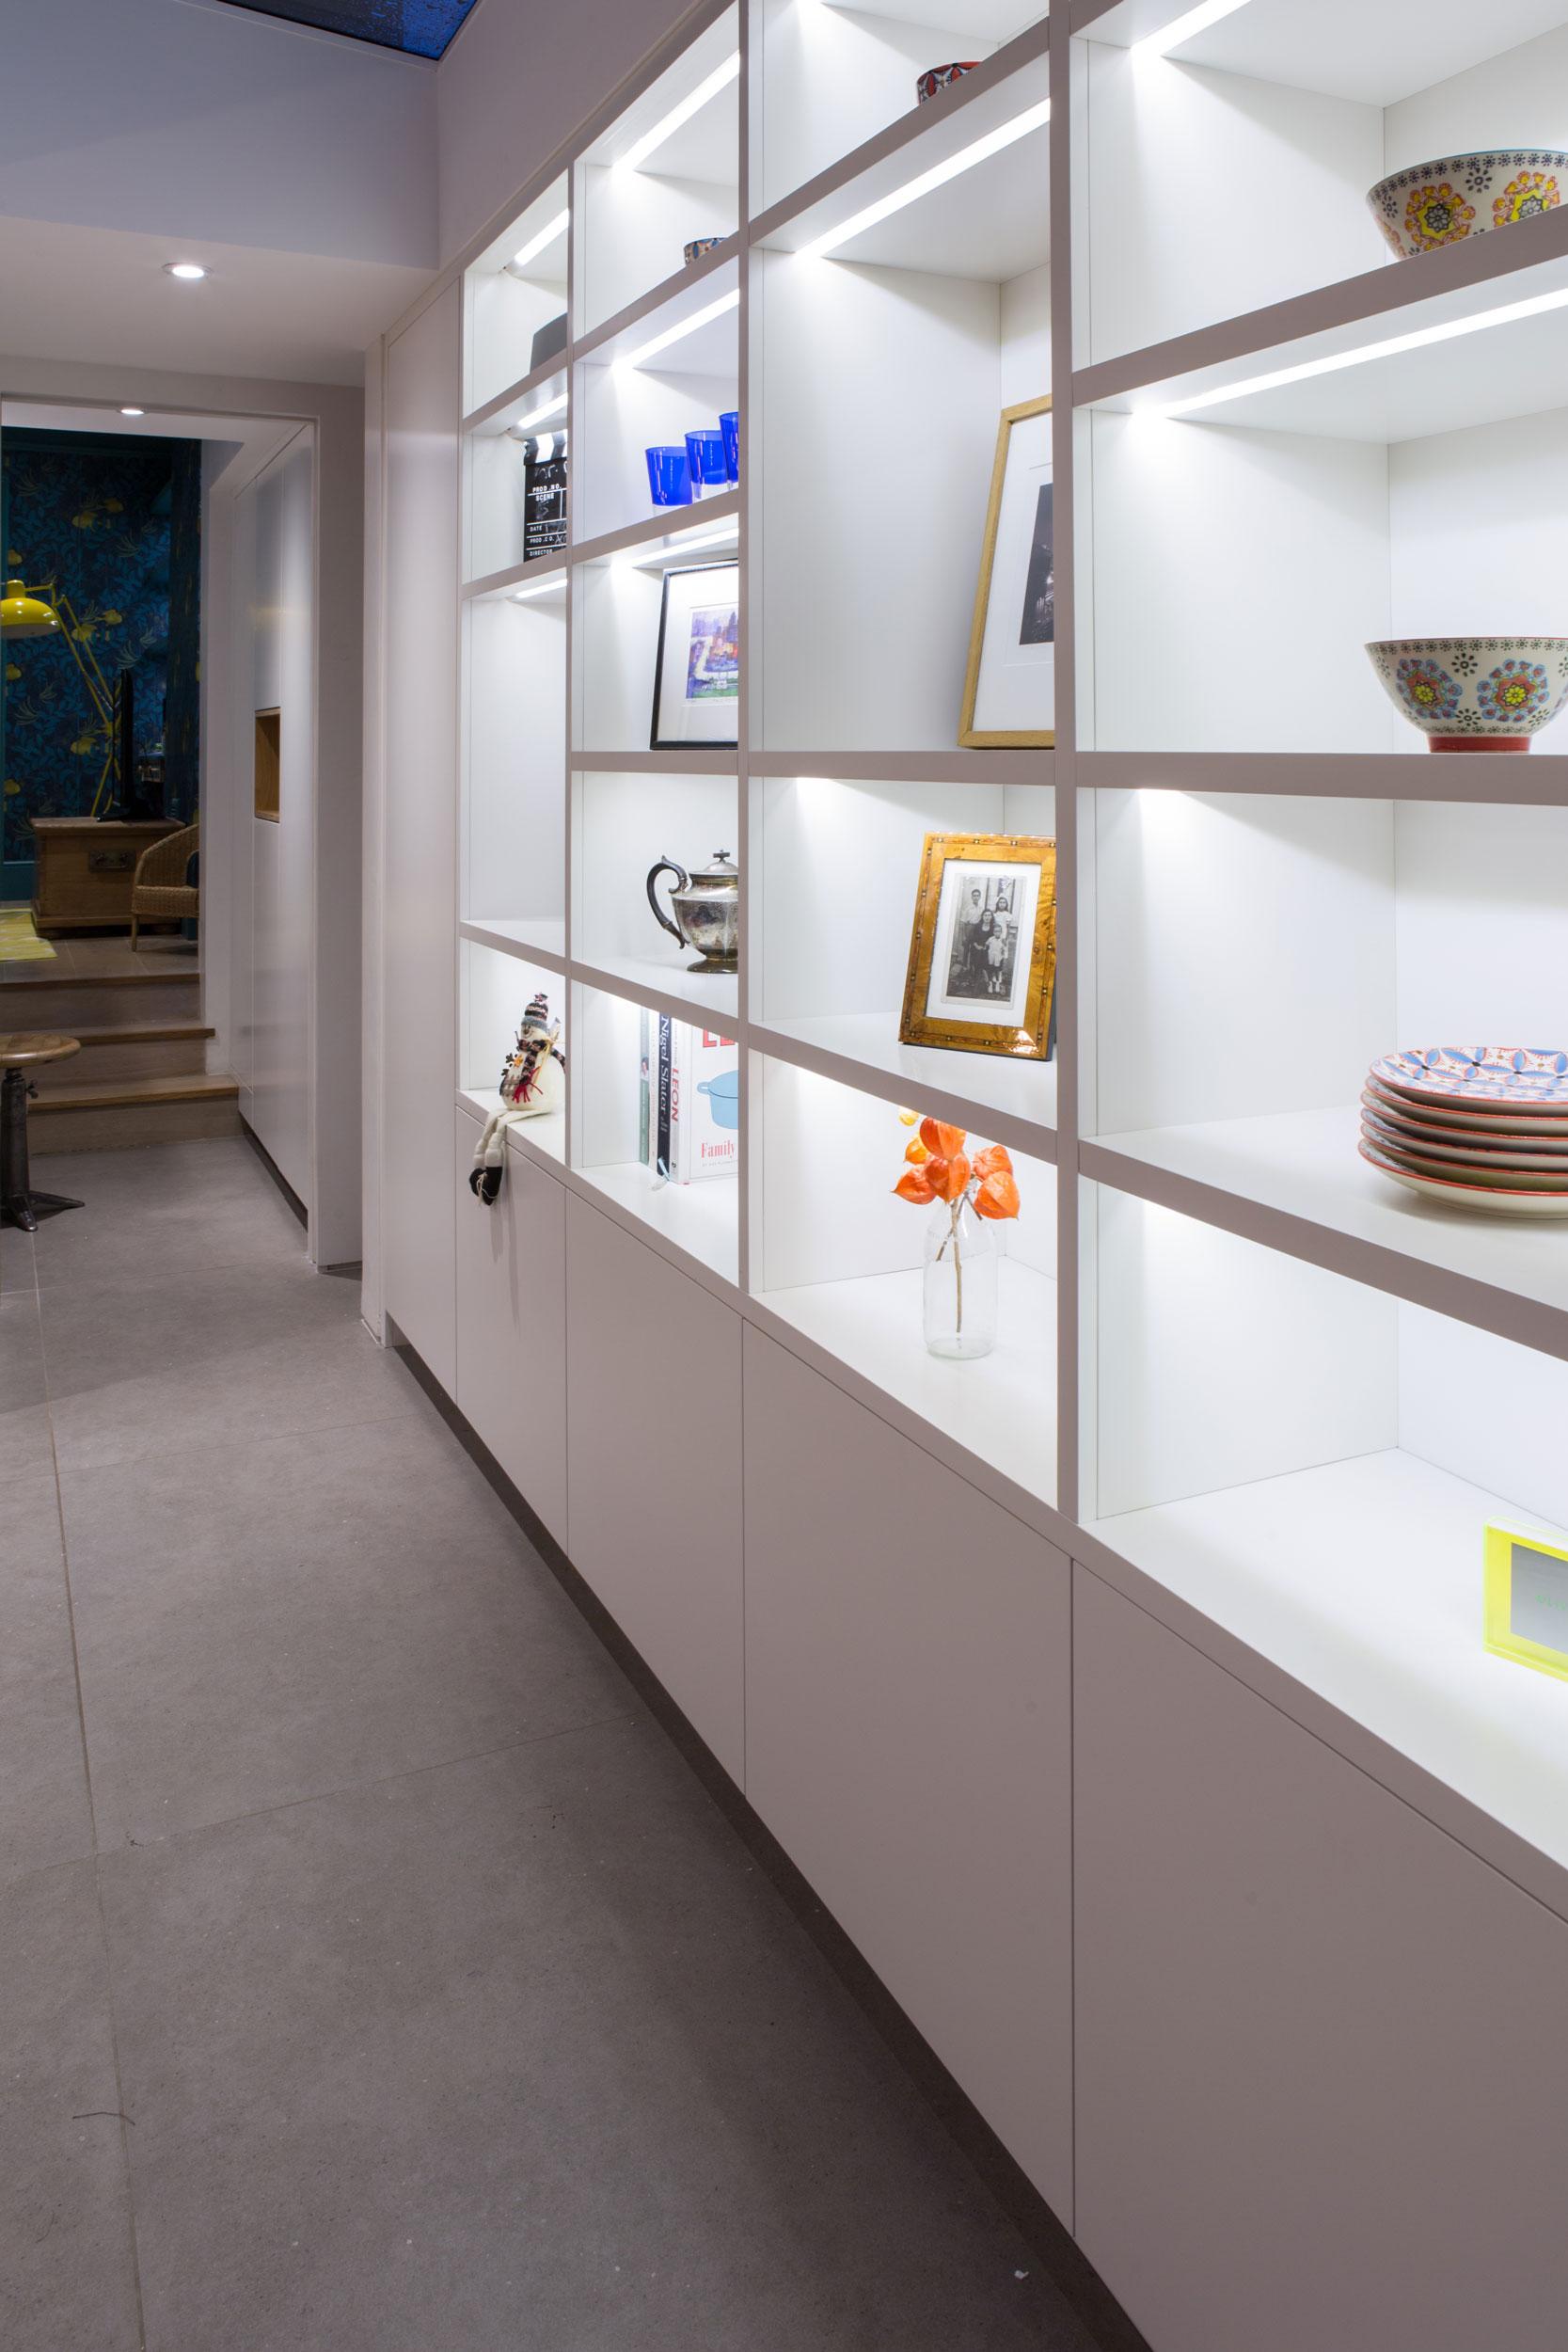 Carpentry Crystal Palace Shelving Unit - West & Reid